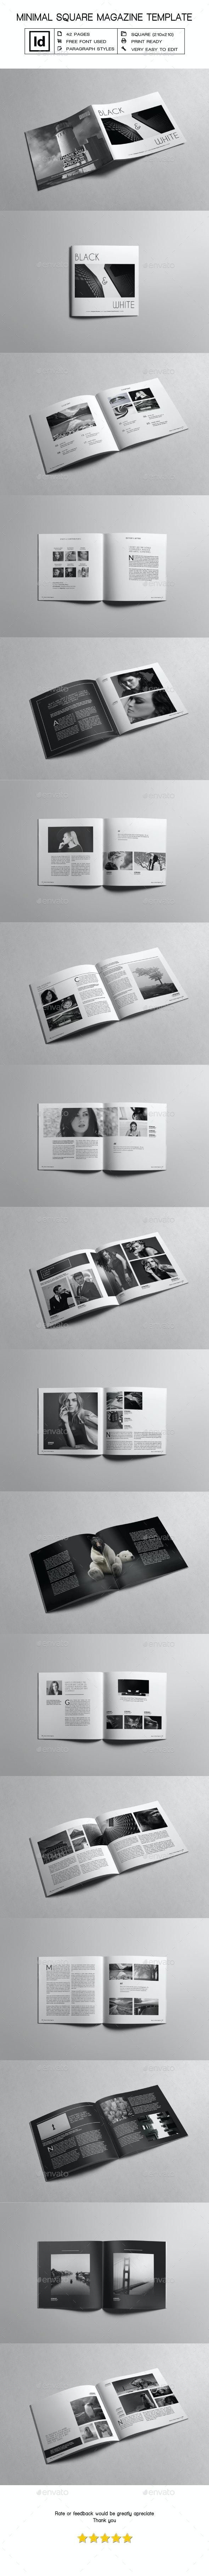 Minimal Square Magazine Template V - Magazines Print Templates